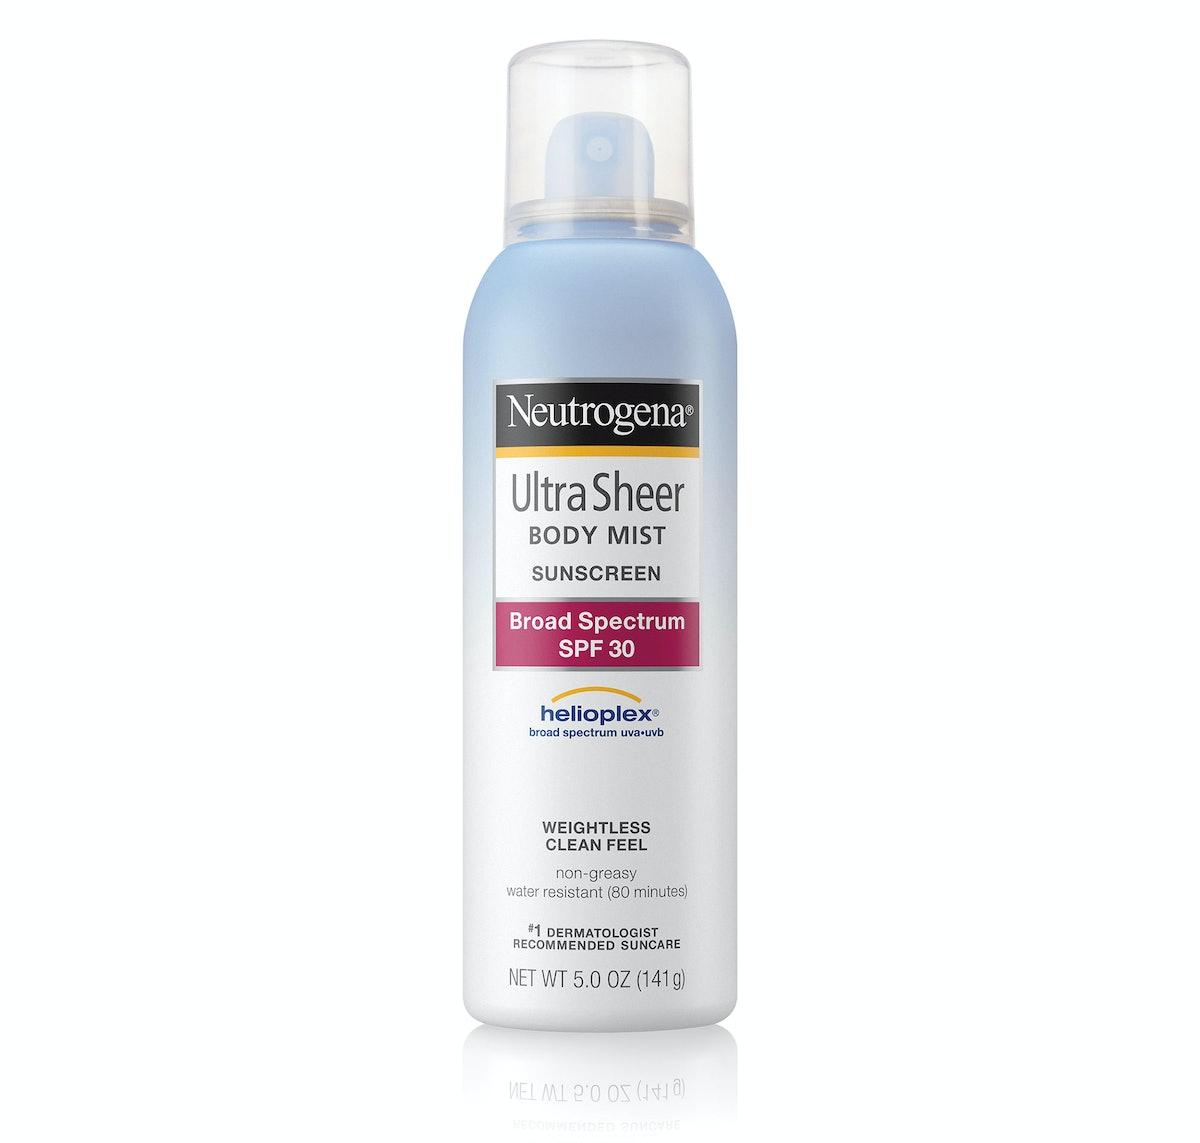 Neutrogena Ultra Sheer Body Mist Sunscreen